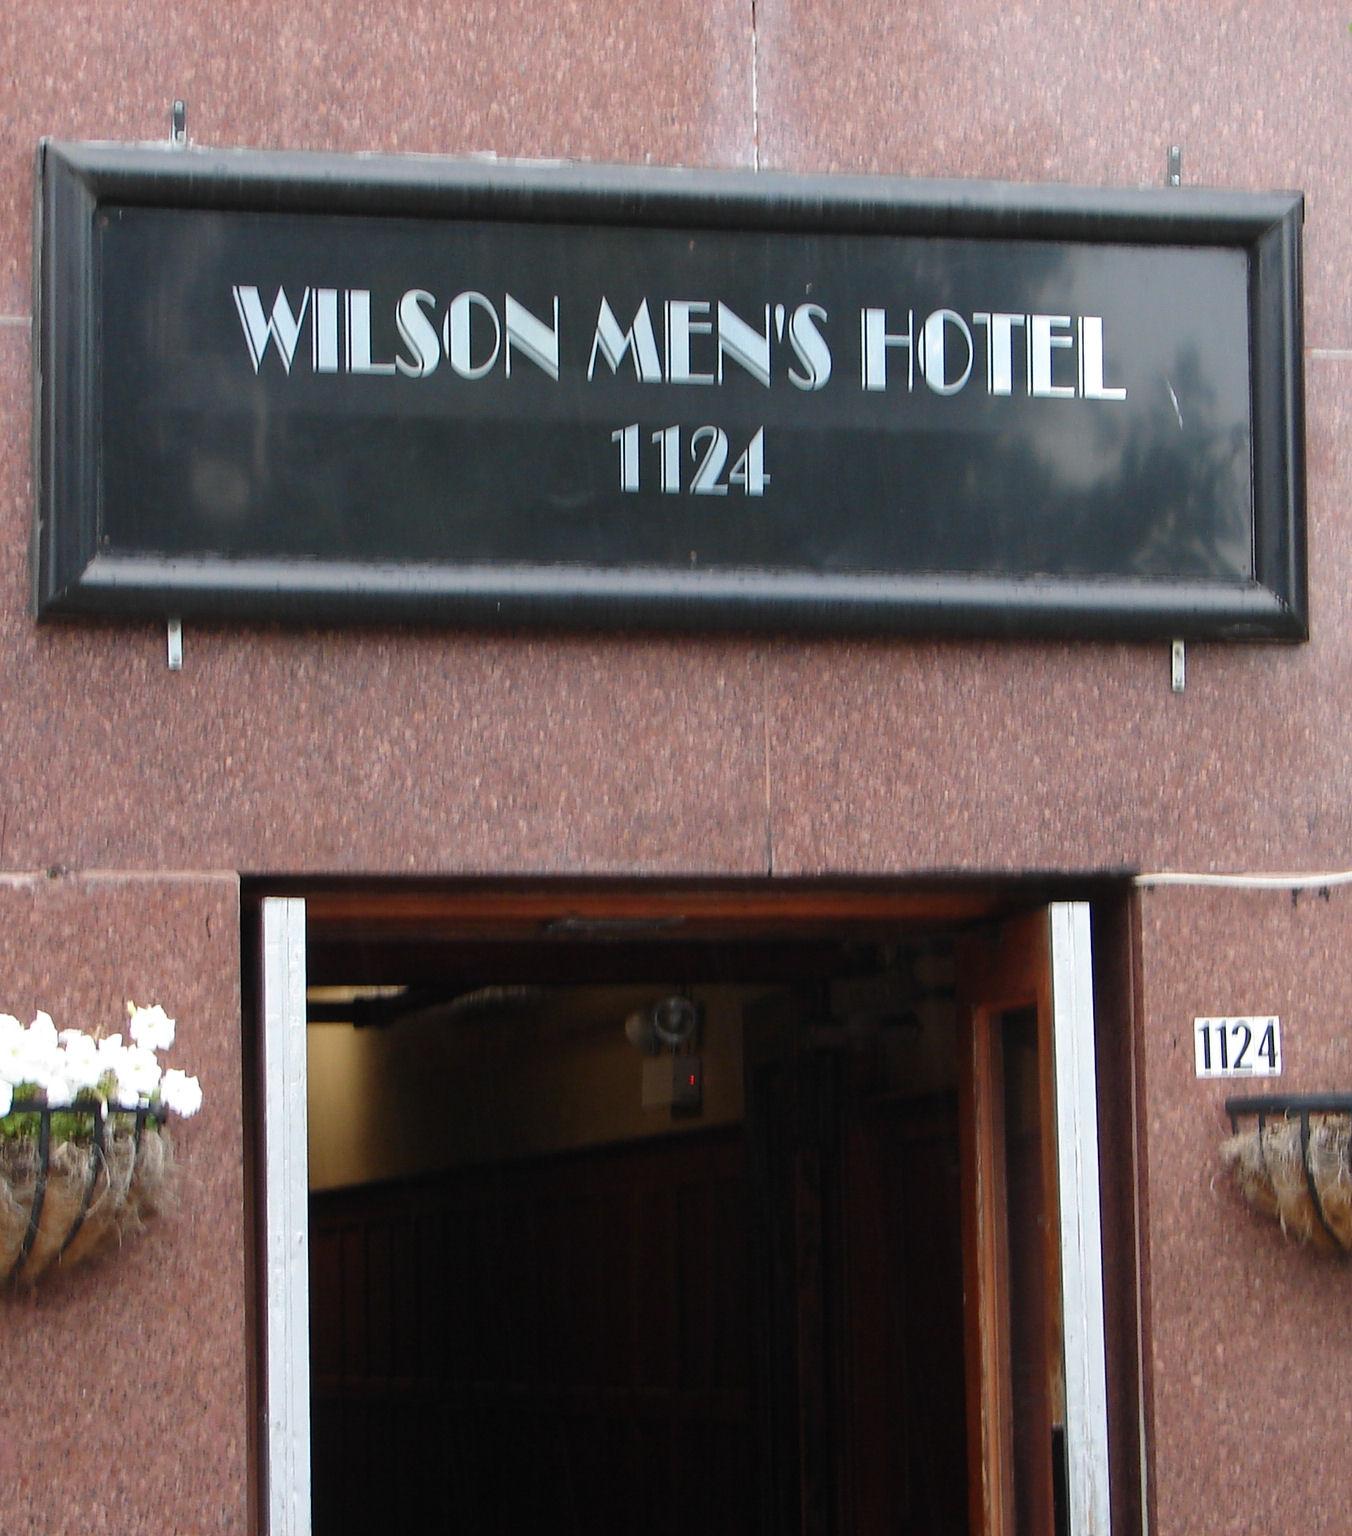 Entrance of Wilson Men's Hotel